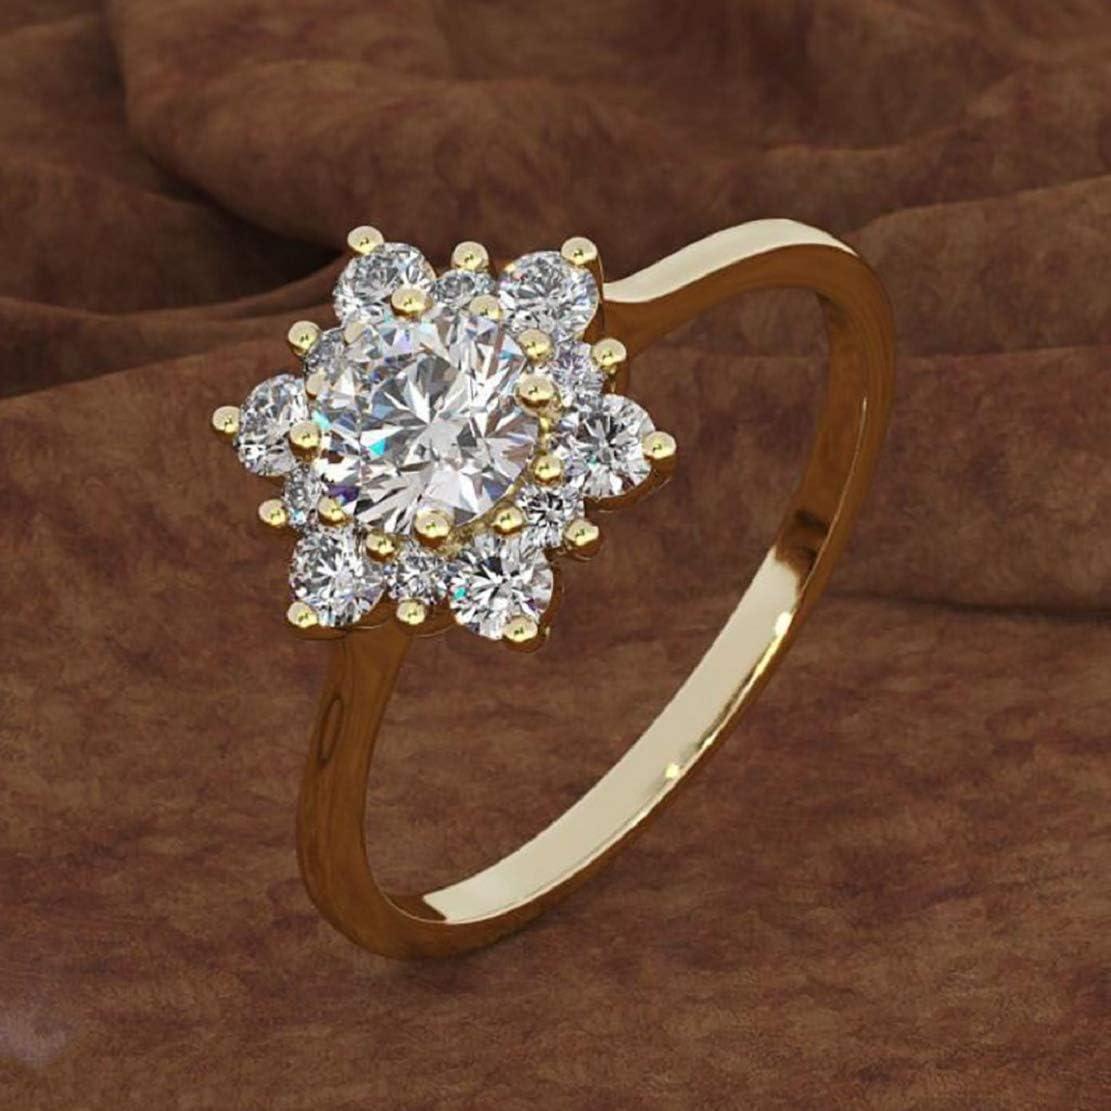 LowProfile Sliver /& Diamonds Jewellery White Plated Round Gemstone Split Shank Flower Design Snowflake Ring Sterling Silver